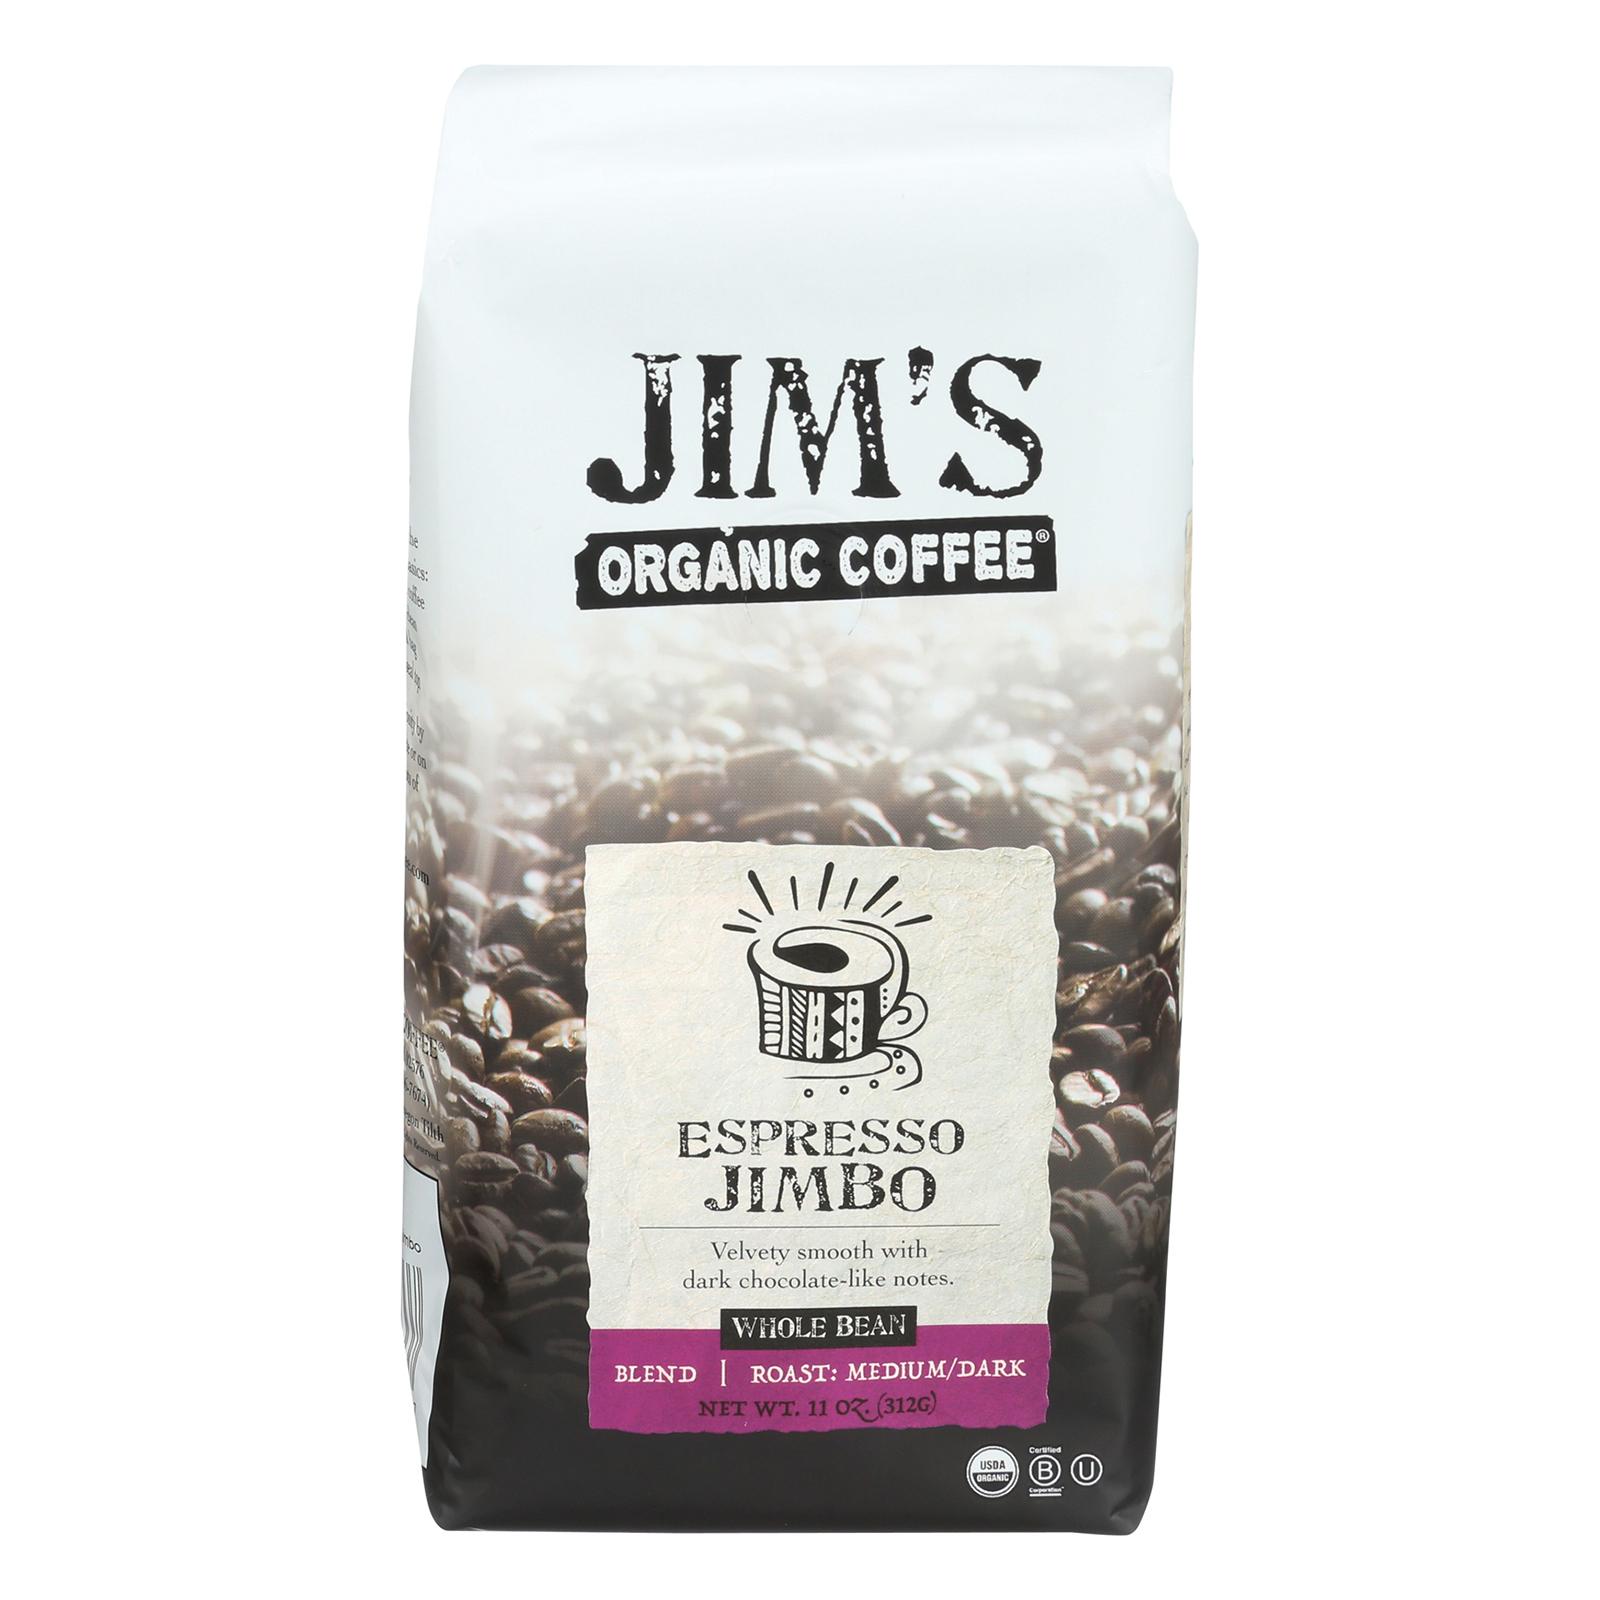 Jim's Organic Coffee - Whole Bean - Espresso Jimbo - Case of 6 - 11 oz.